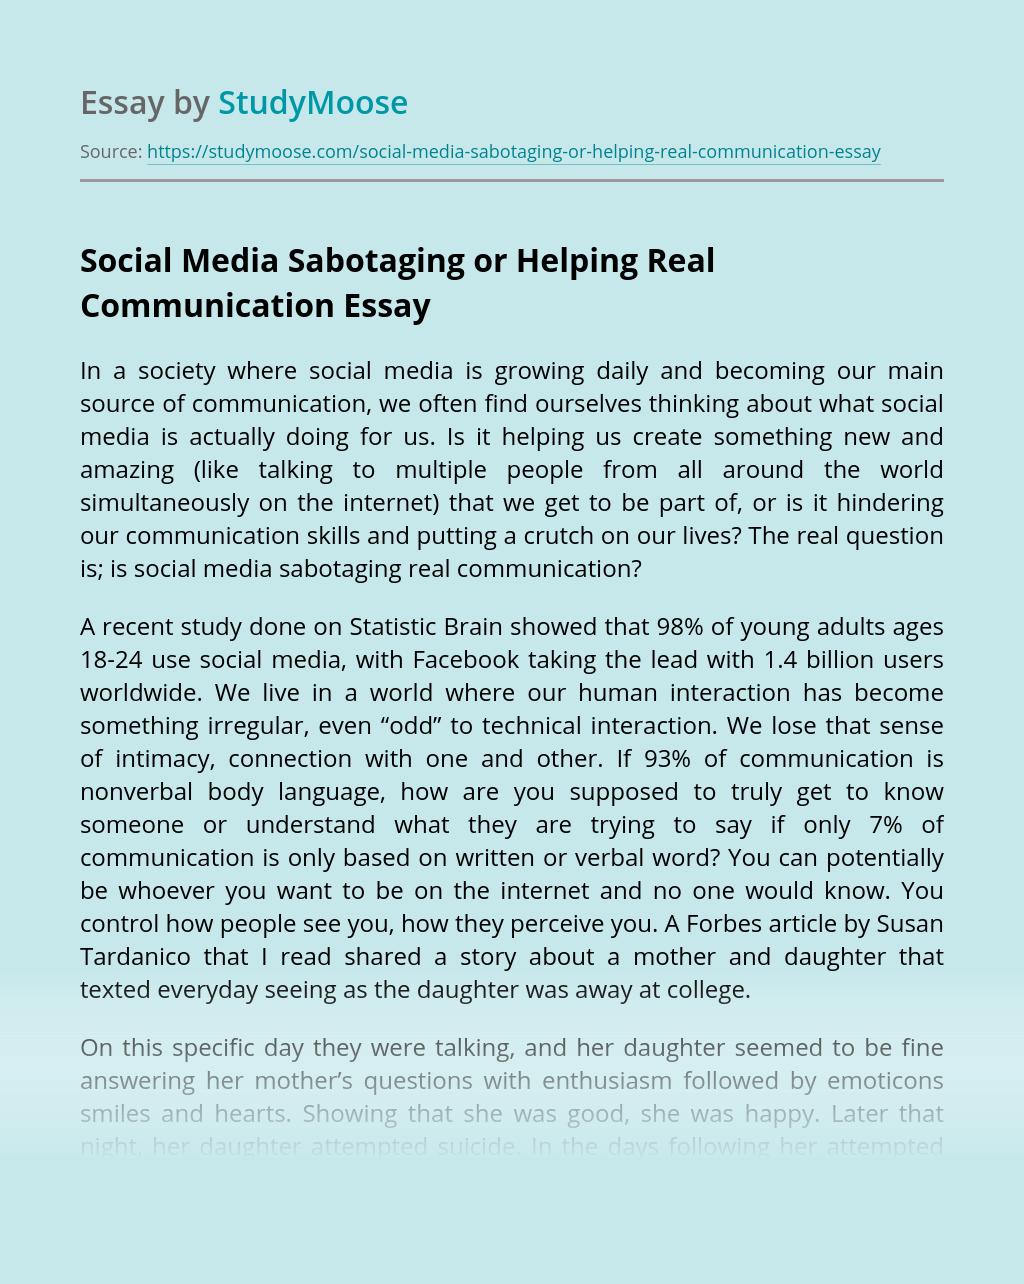 Social Media Sabotaging or Helping Real Communication